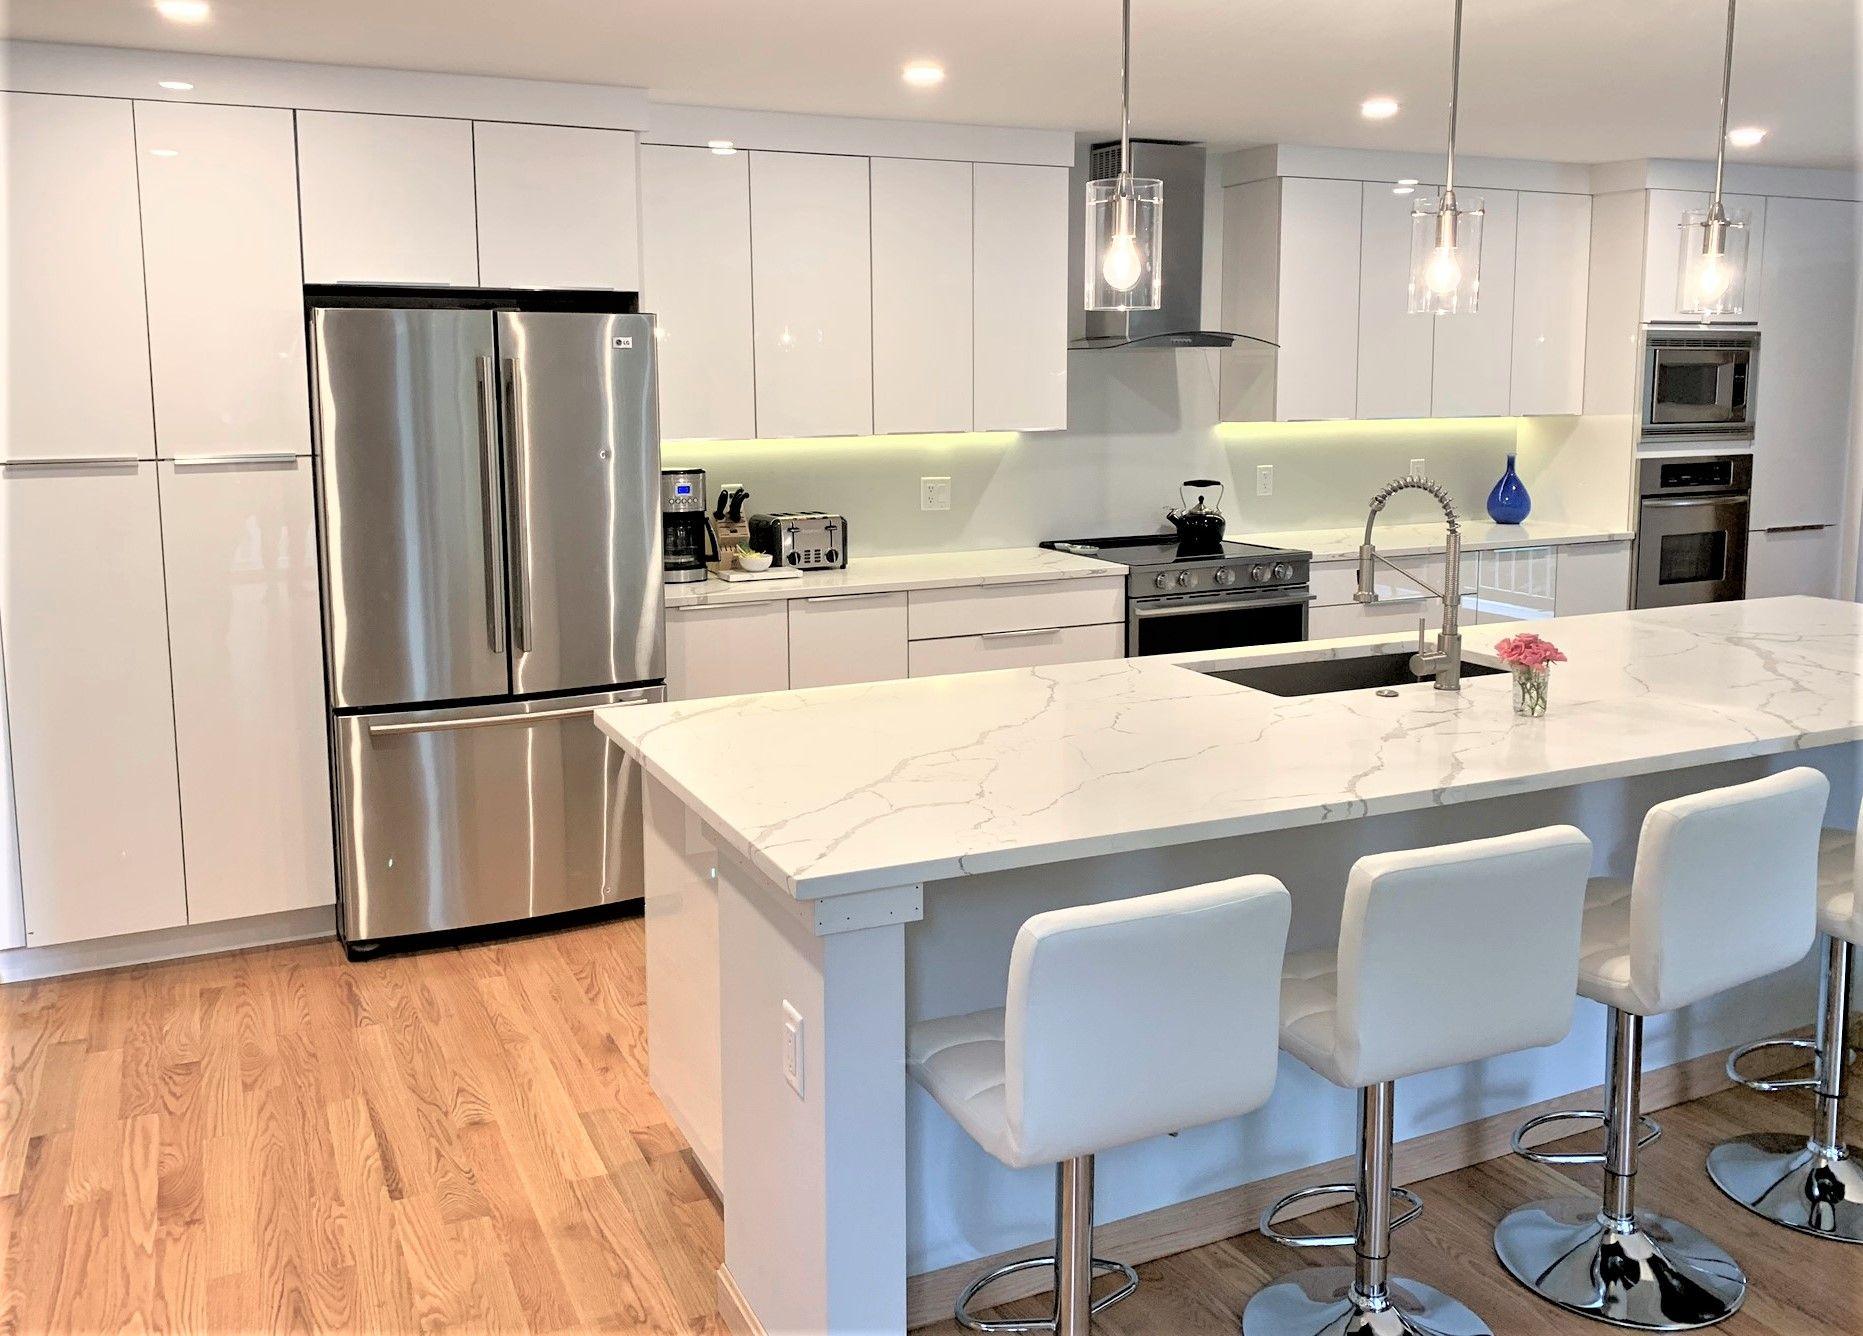 Contemporary Kitchen Redesign Contemporary Kitchen Kitchen Redesign Kitchen And Bath Design